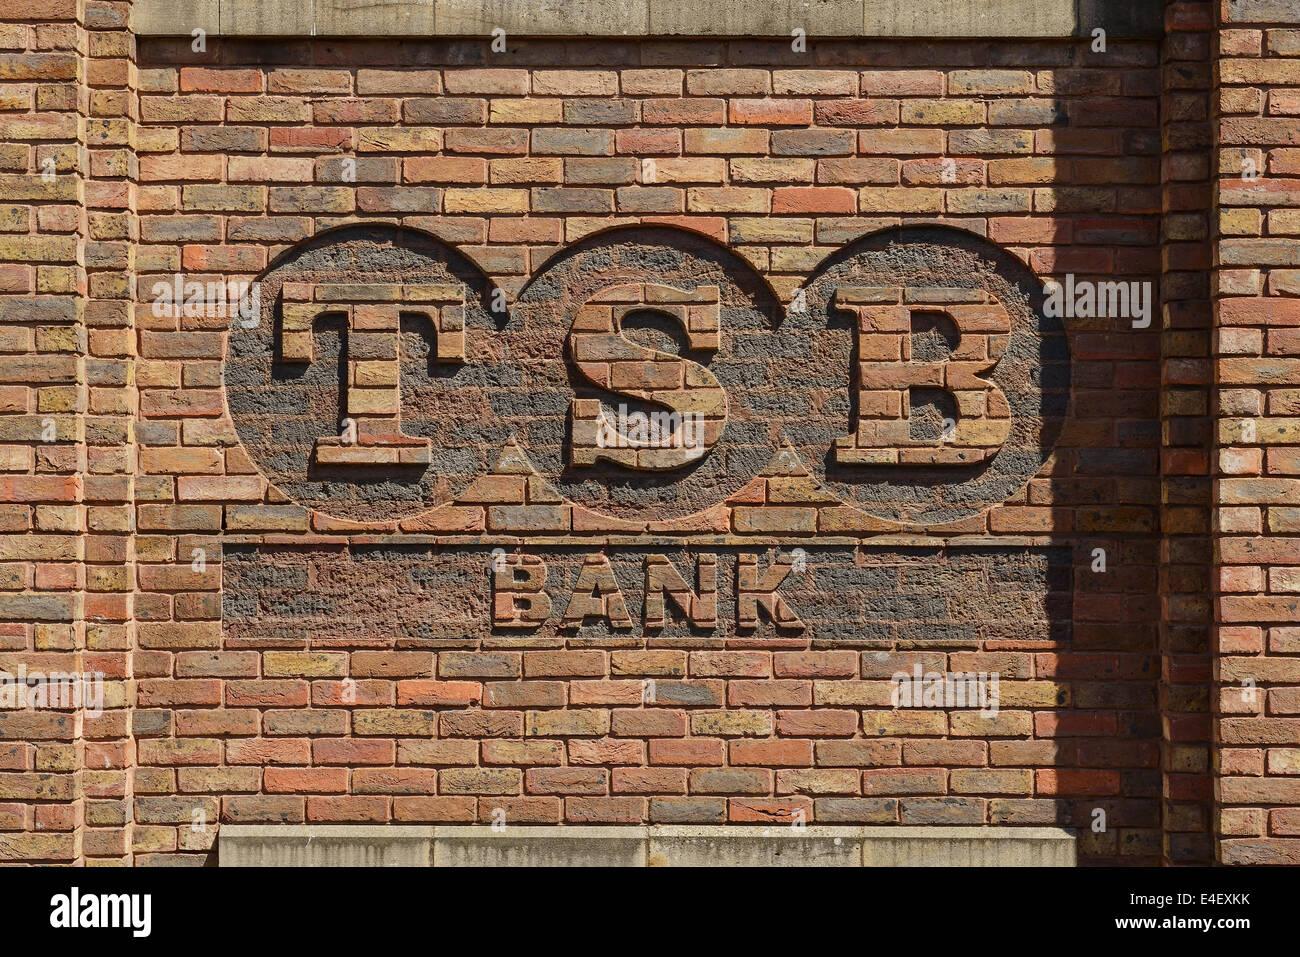 TSB Bank logo carved in decorative brickwork - Stock Image